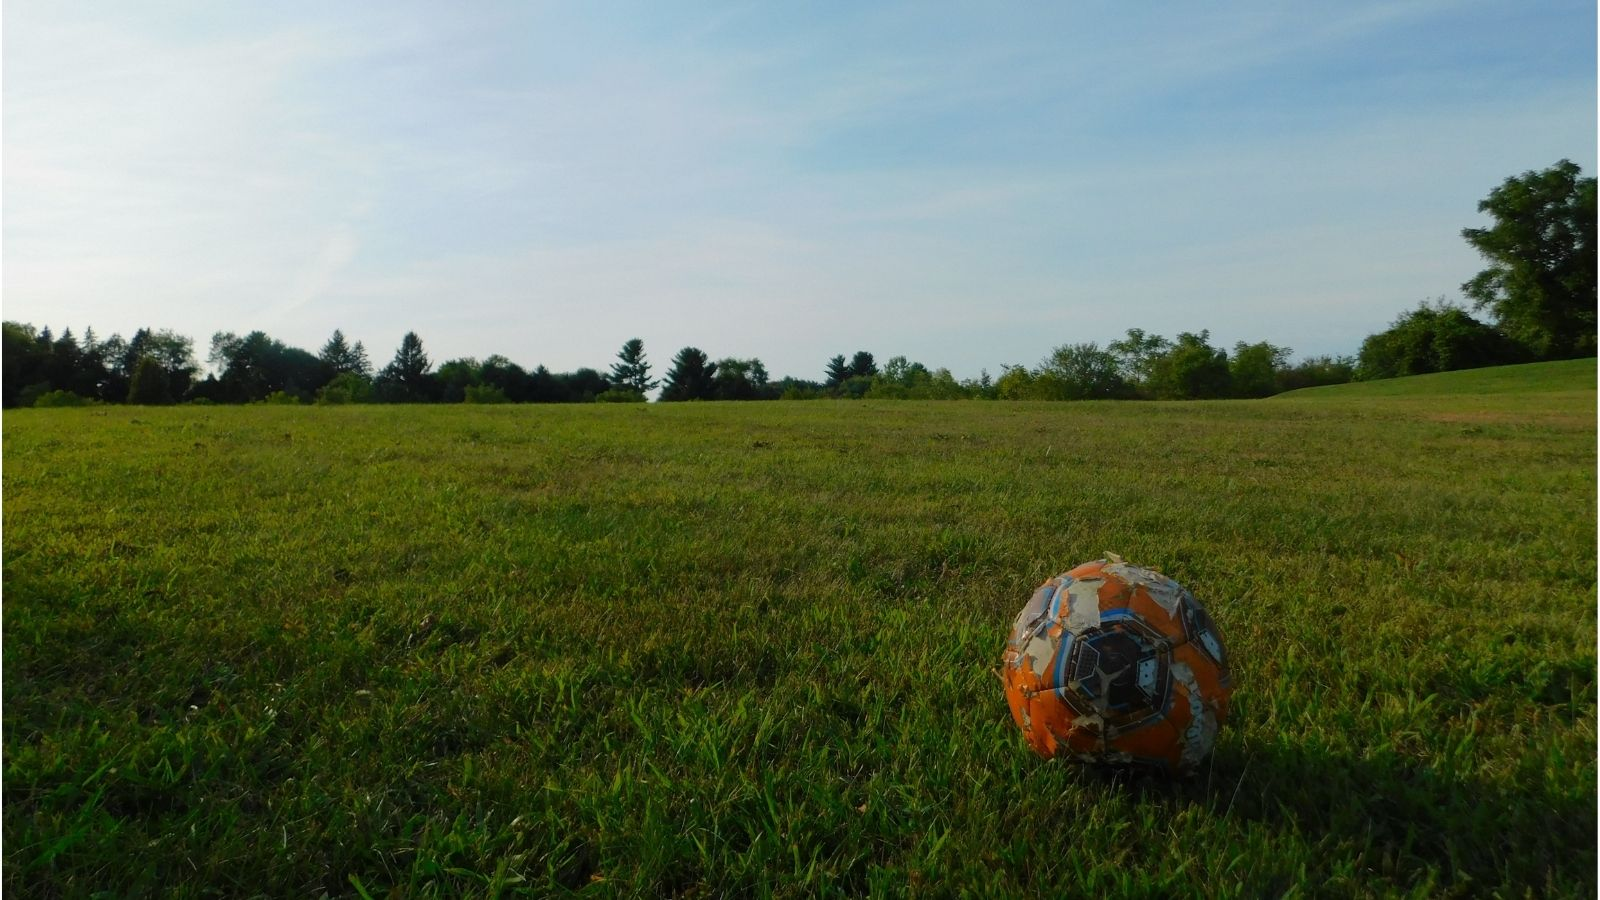 Old football on grass field